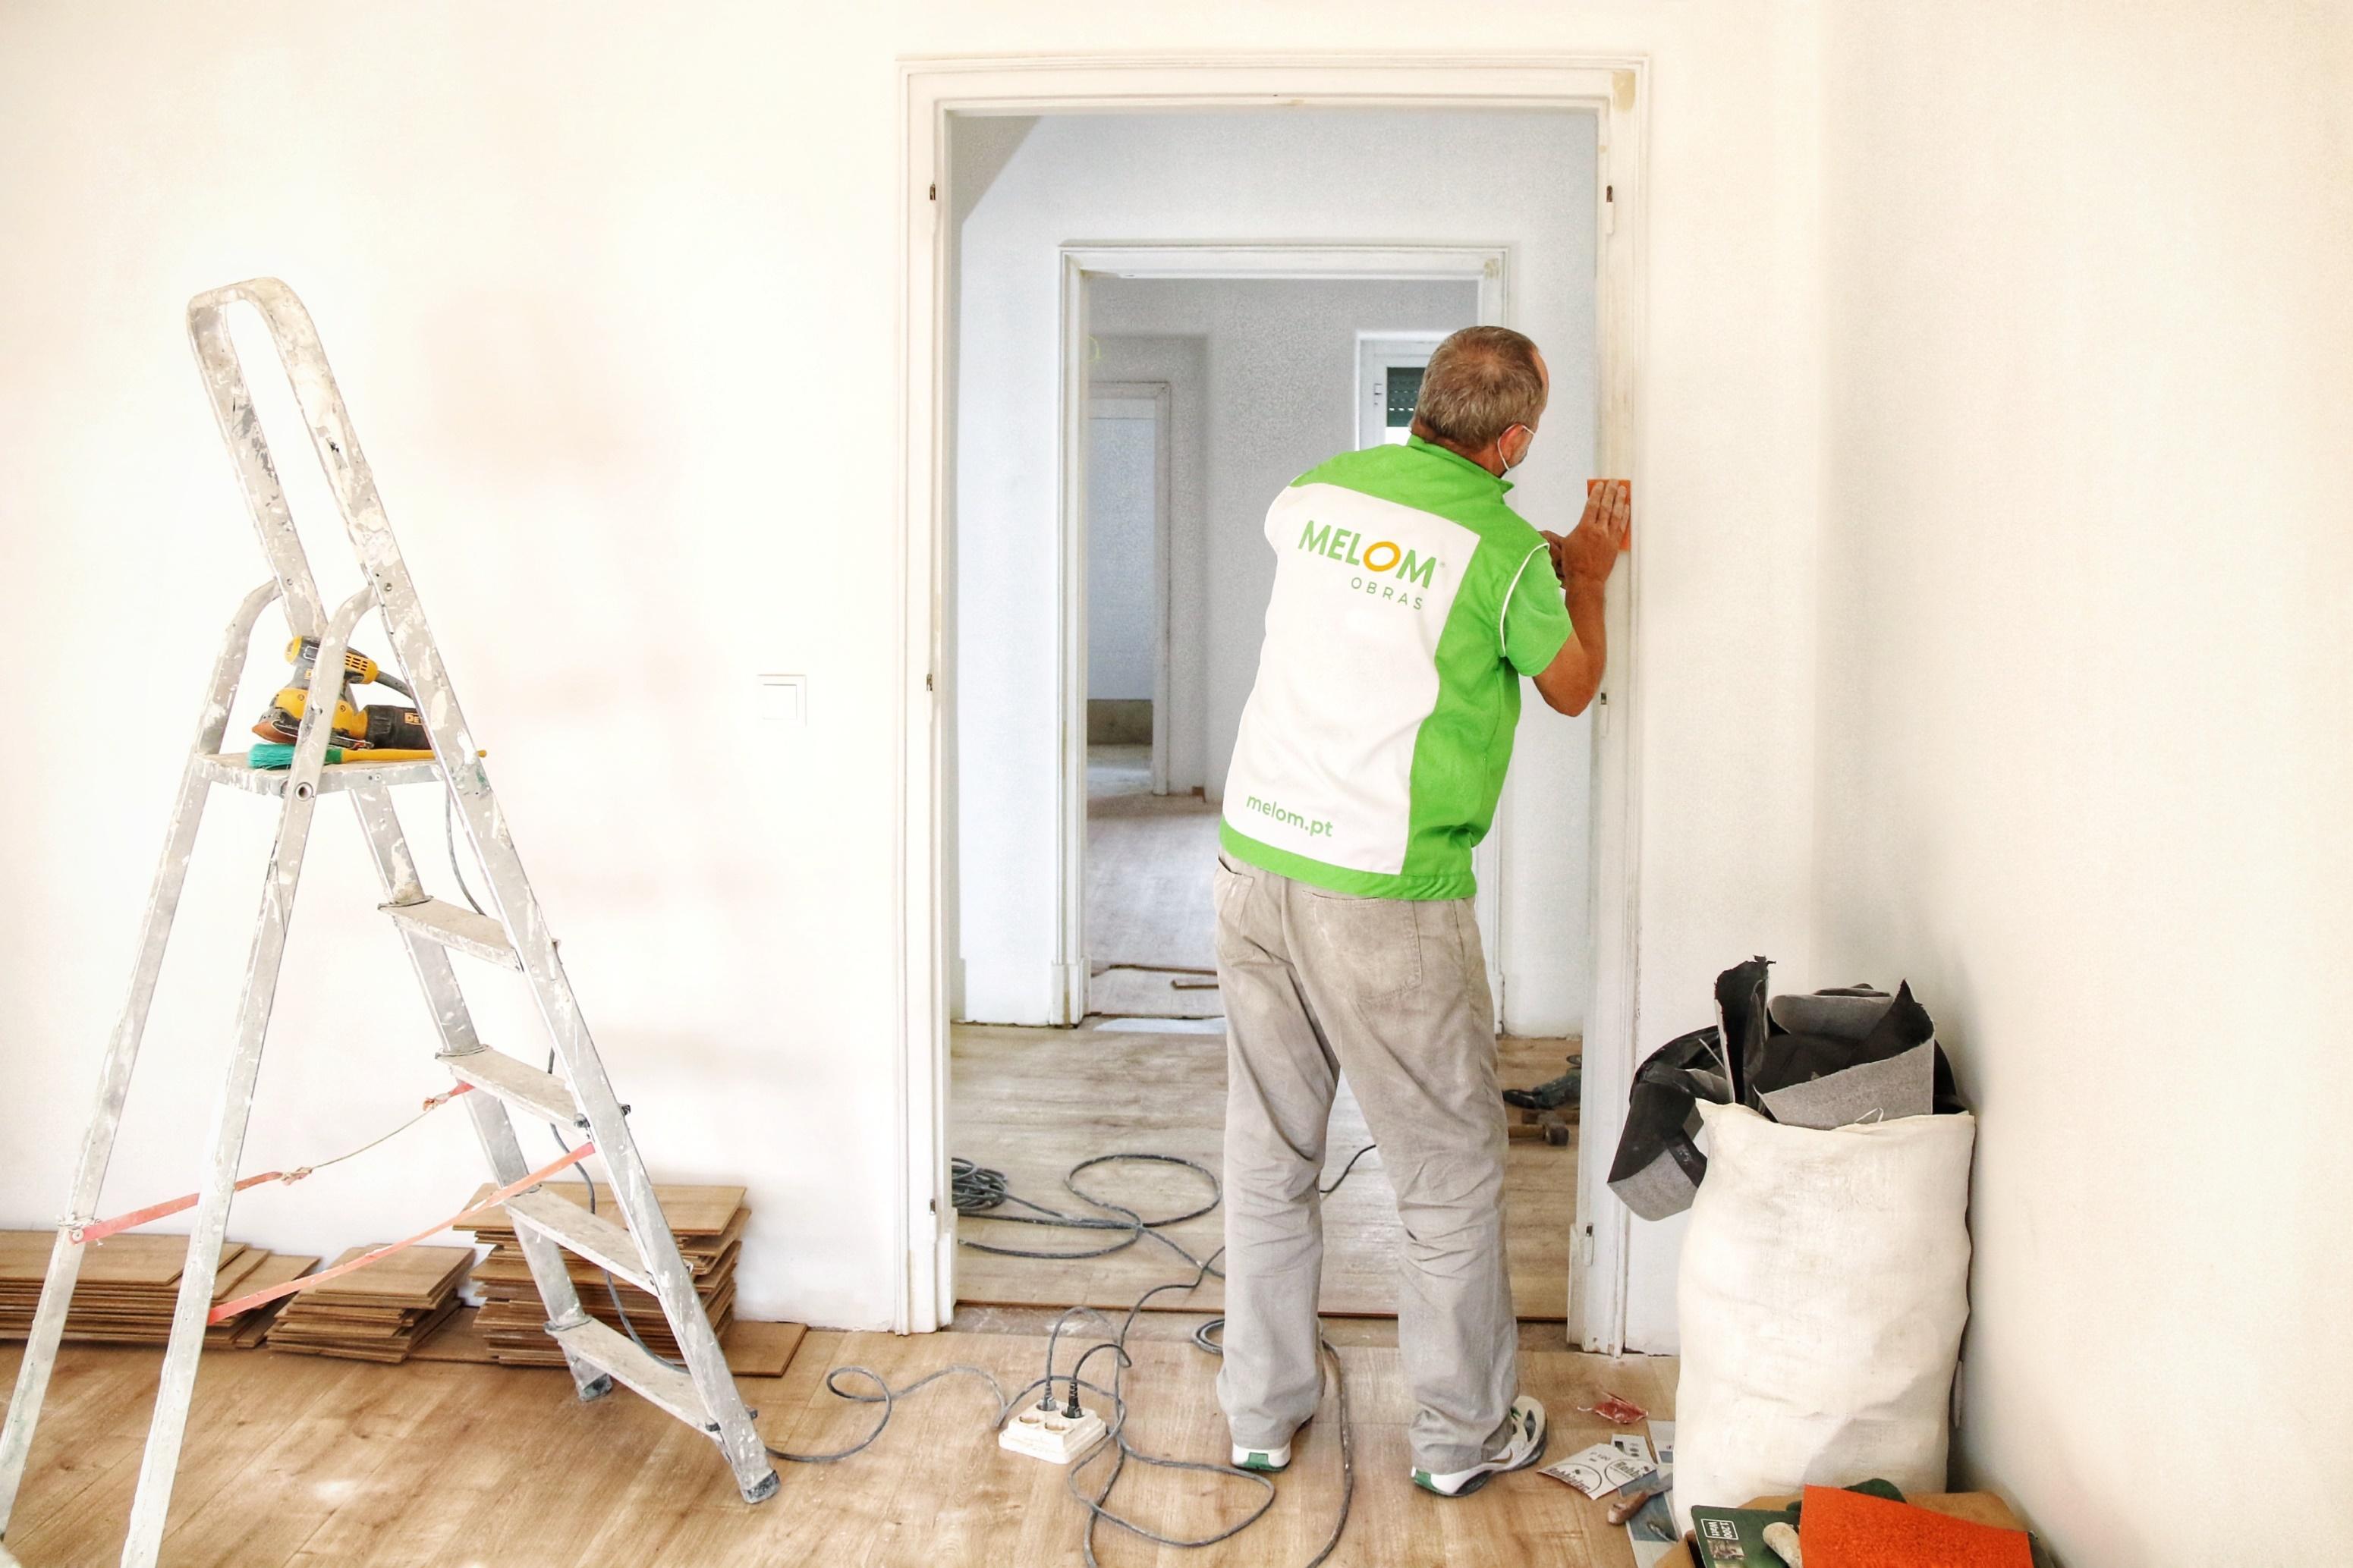 MELOM / Querido Mudei a Casa Obras